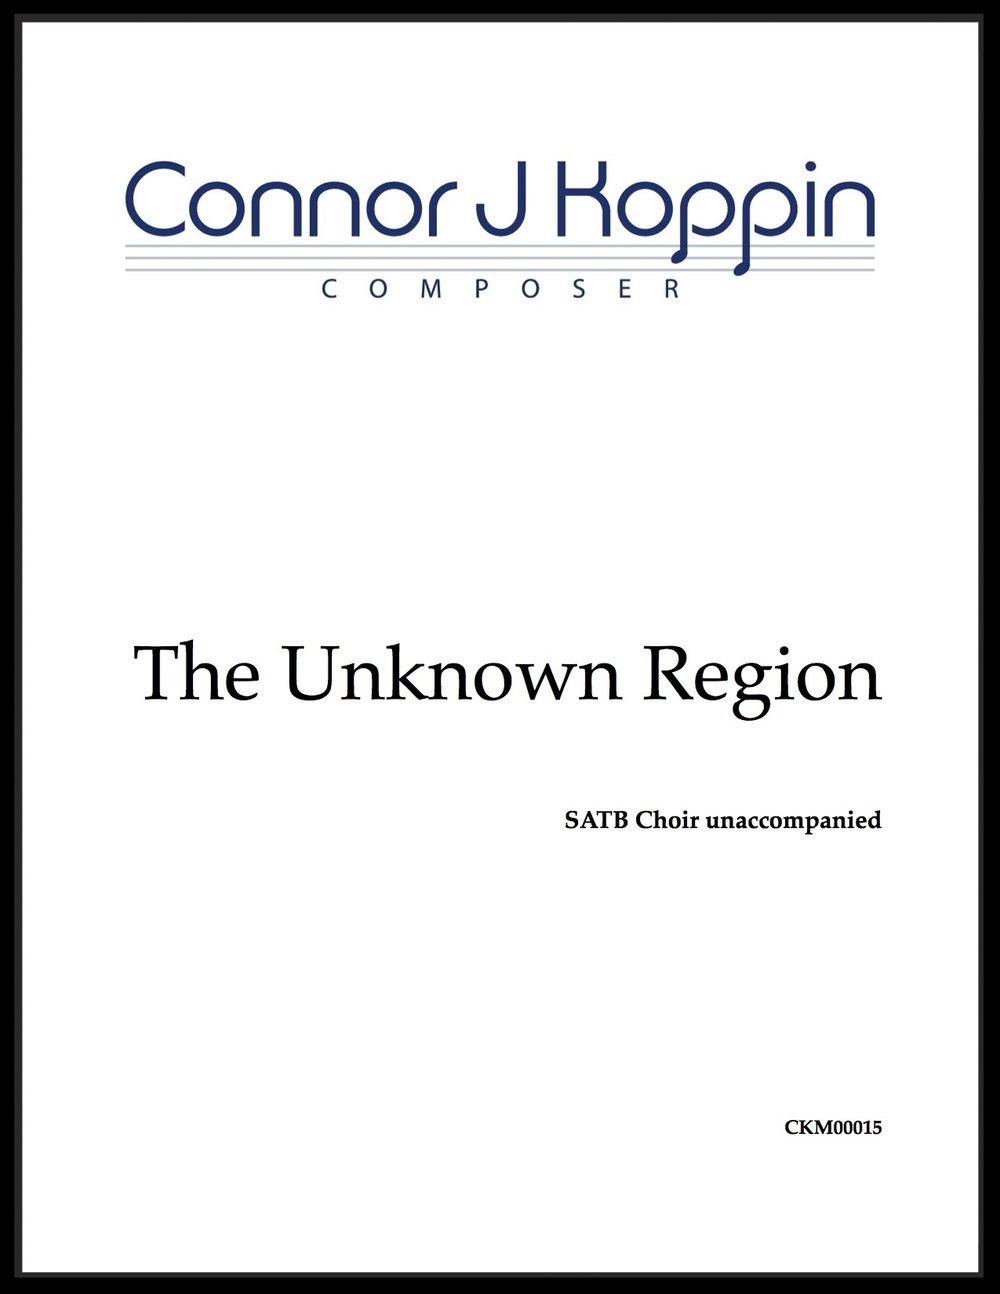 The Unknown Region-jpeg.jpg